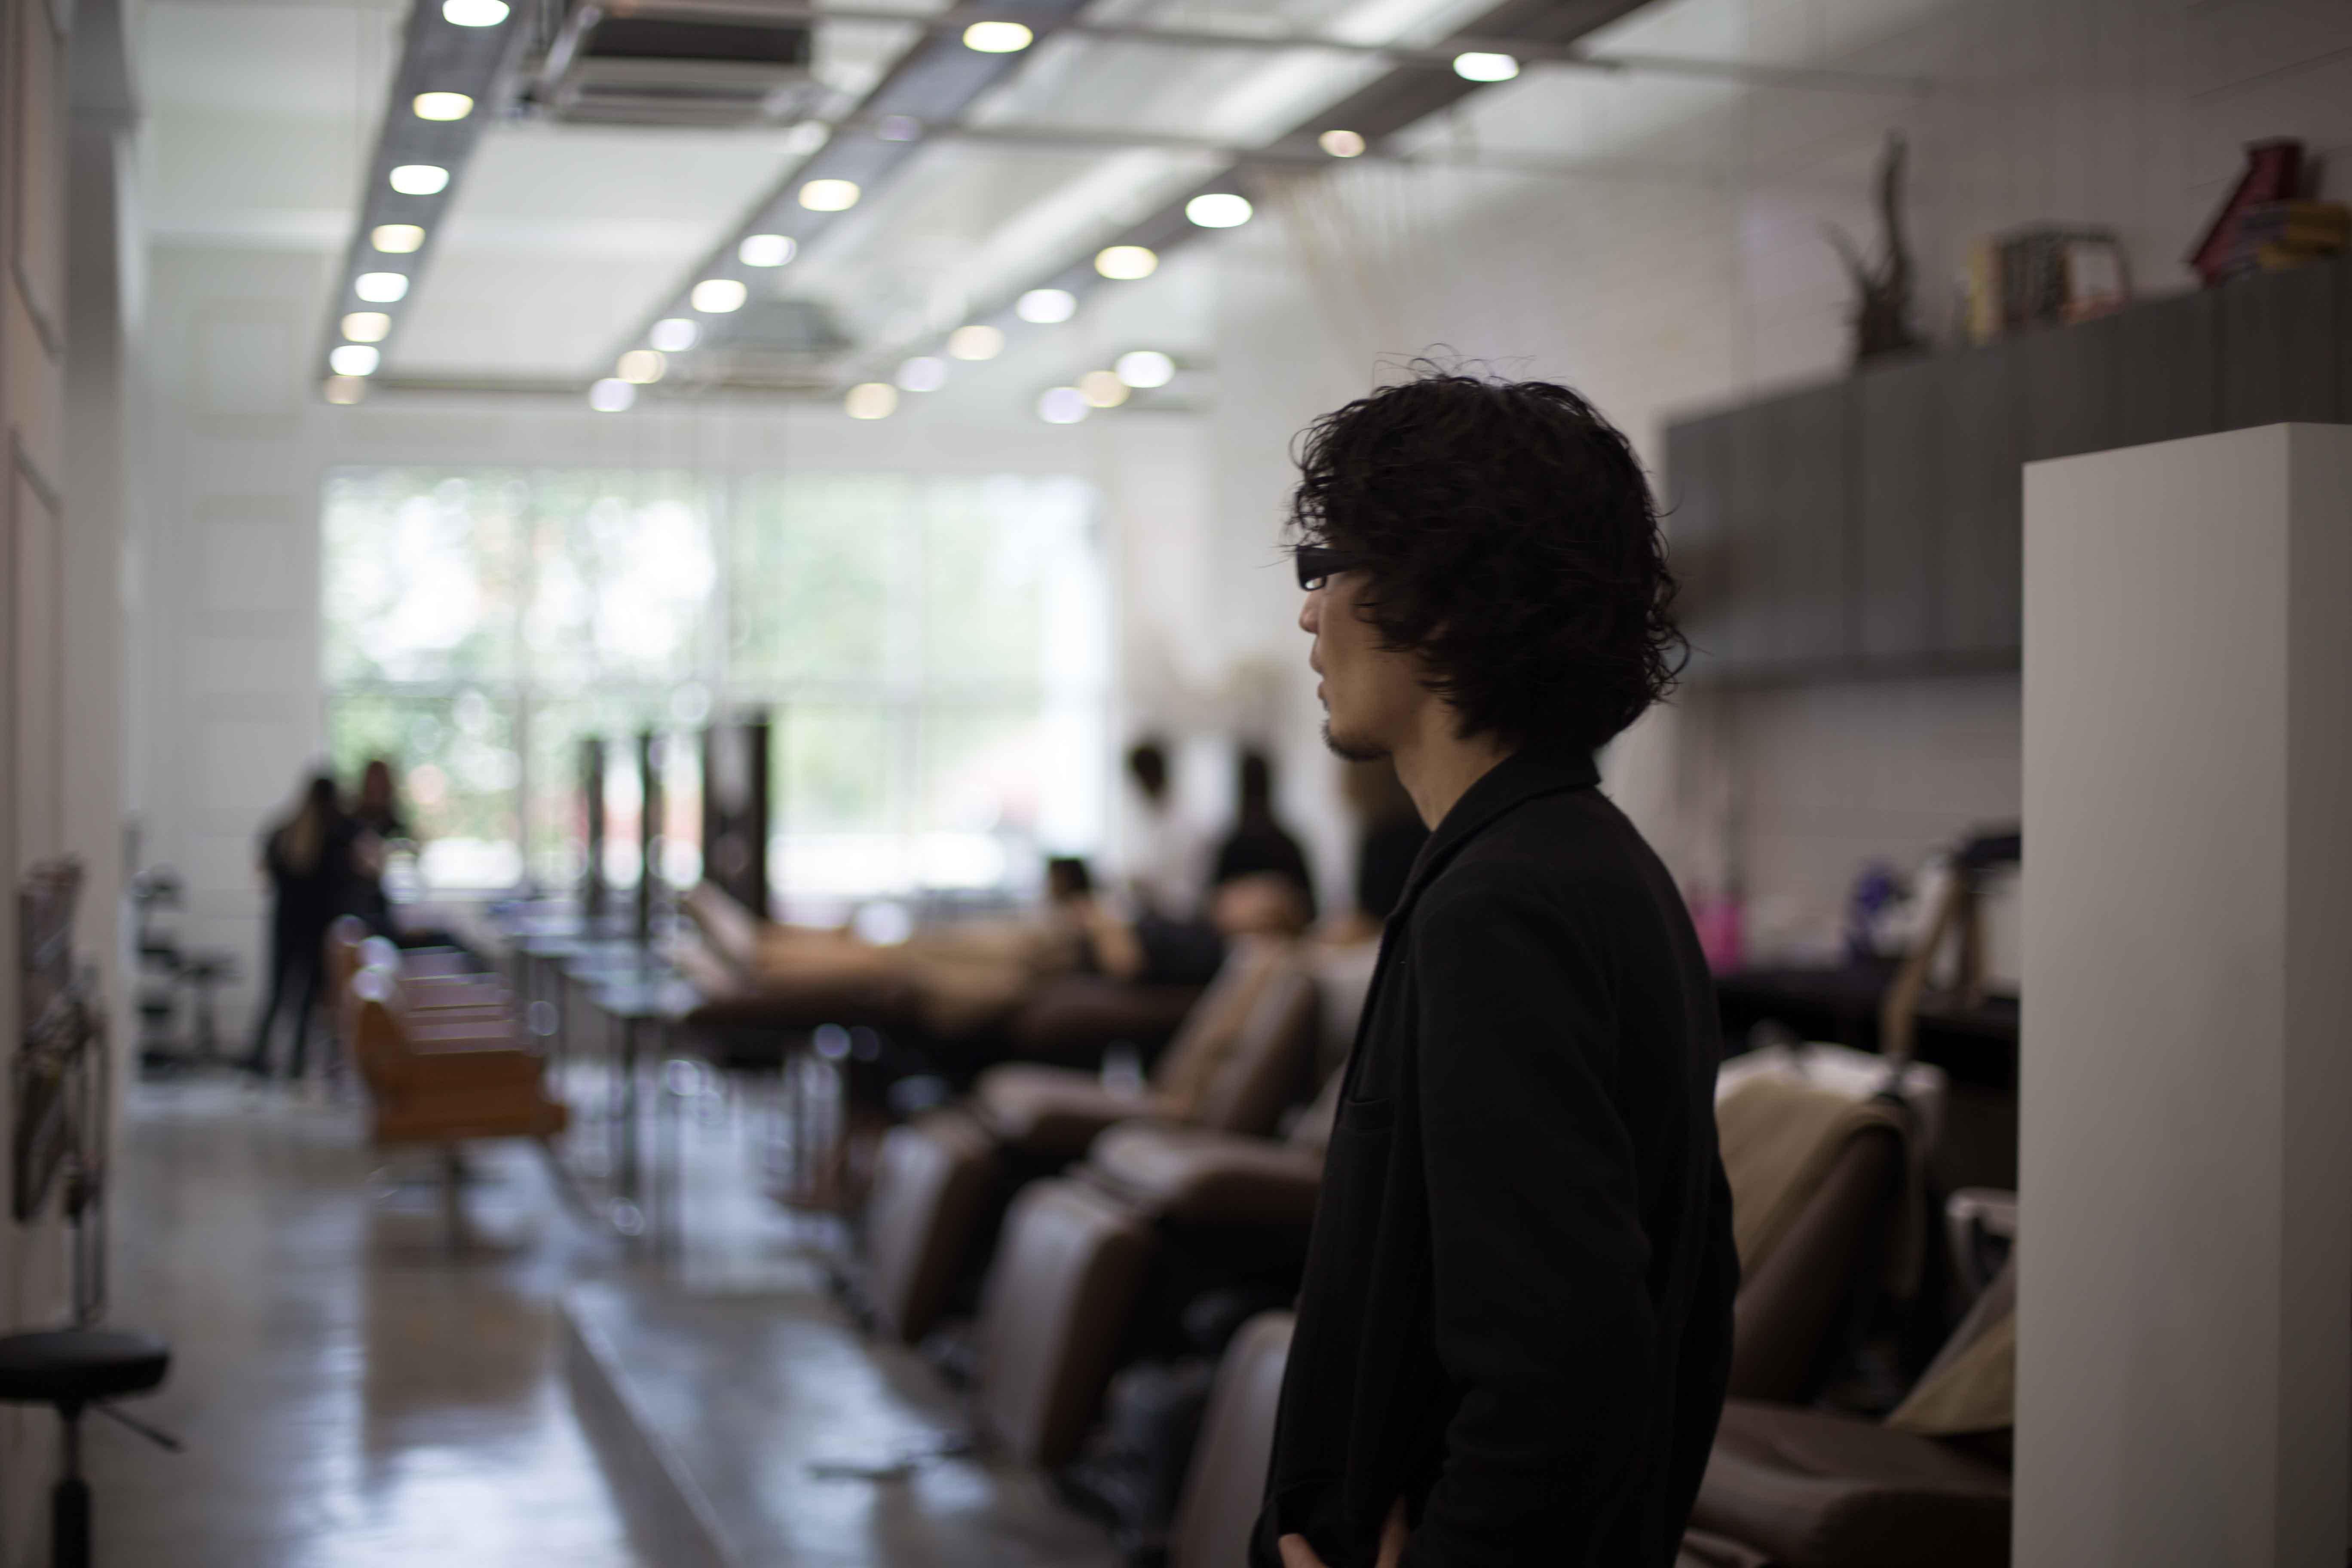 Number76 シンガポール マレーシア クアラルンプール 日系美容室 海外就職 転職 日本人美容師 日本人スタイリスト